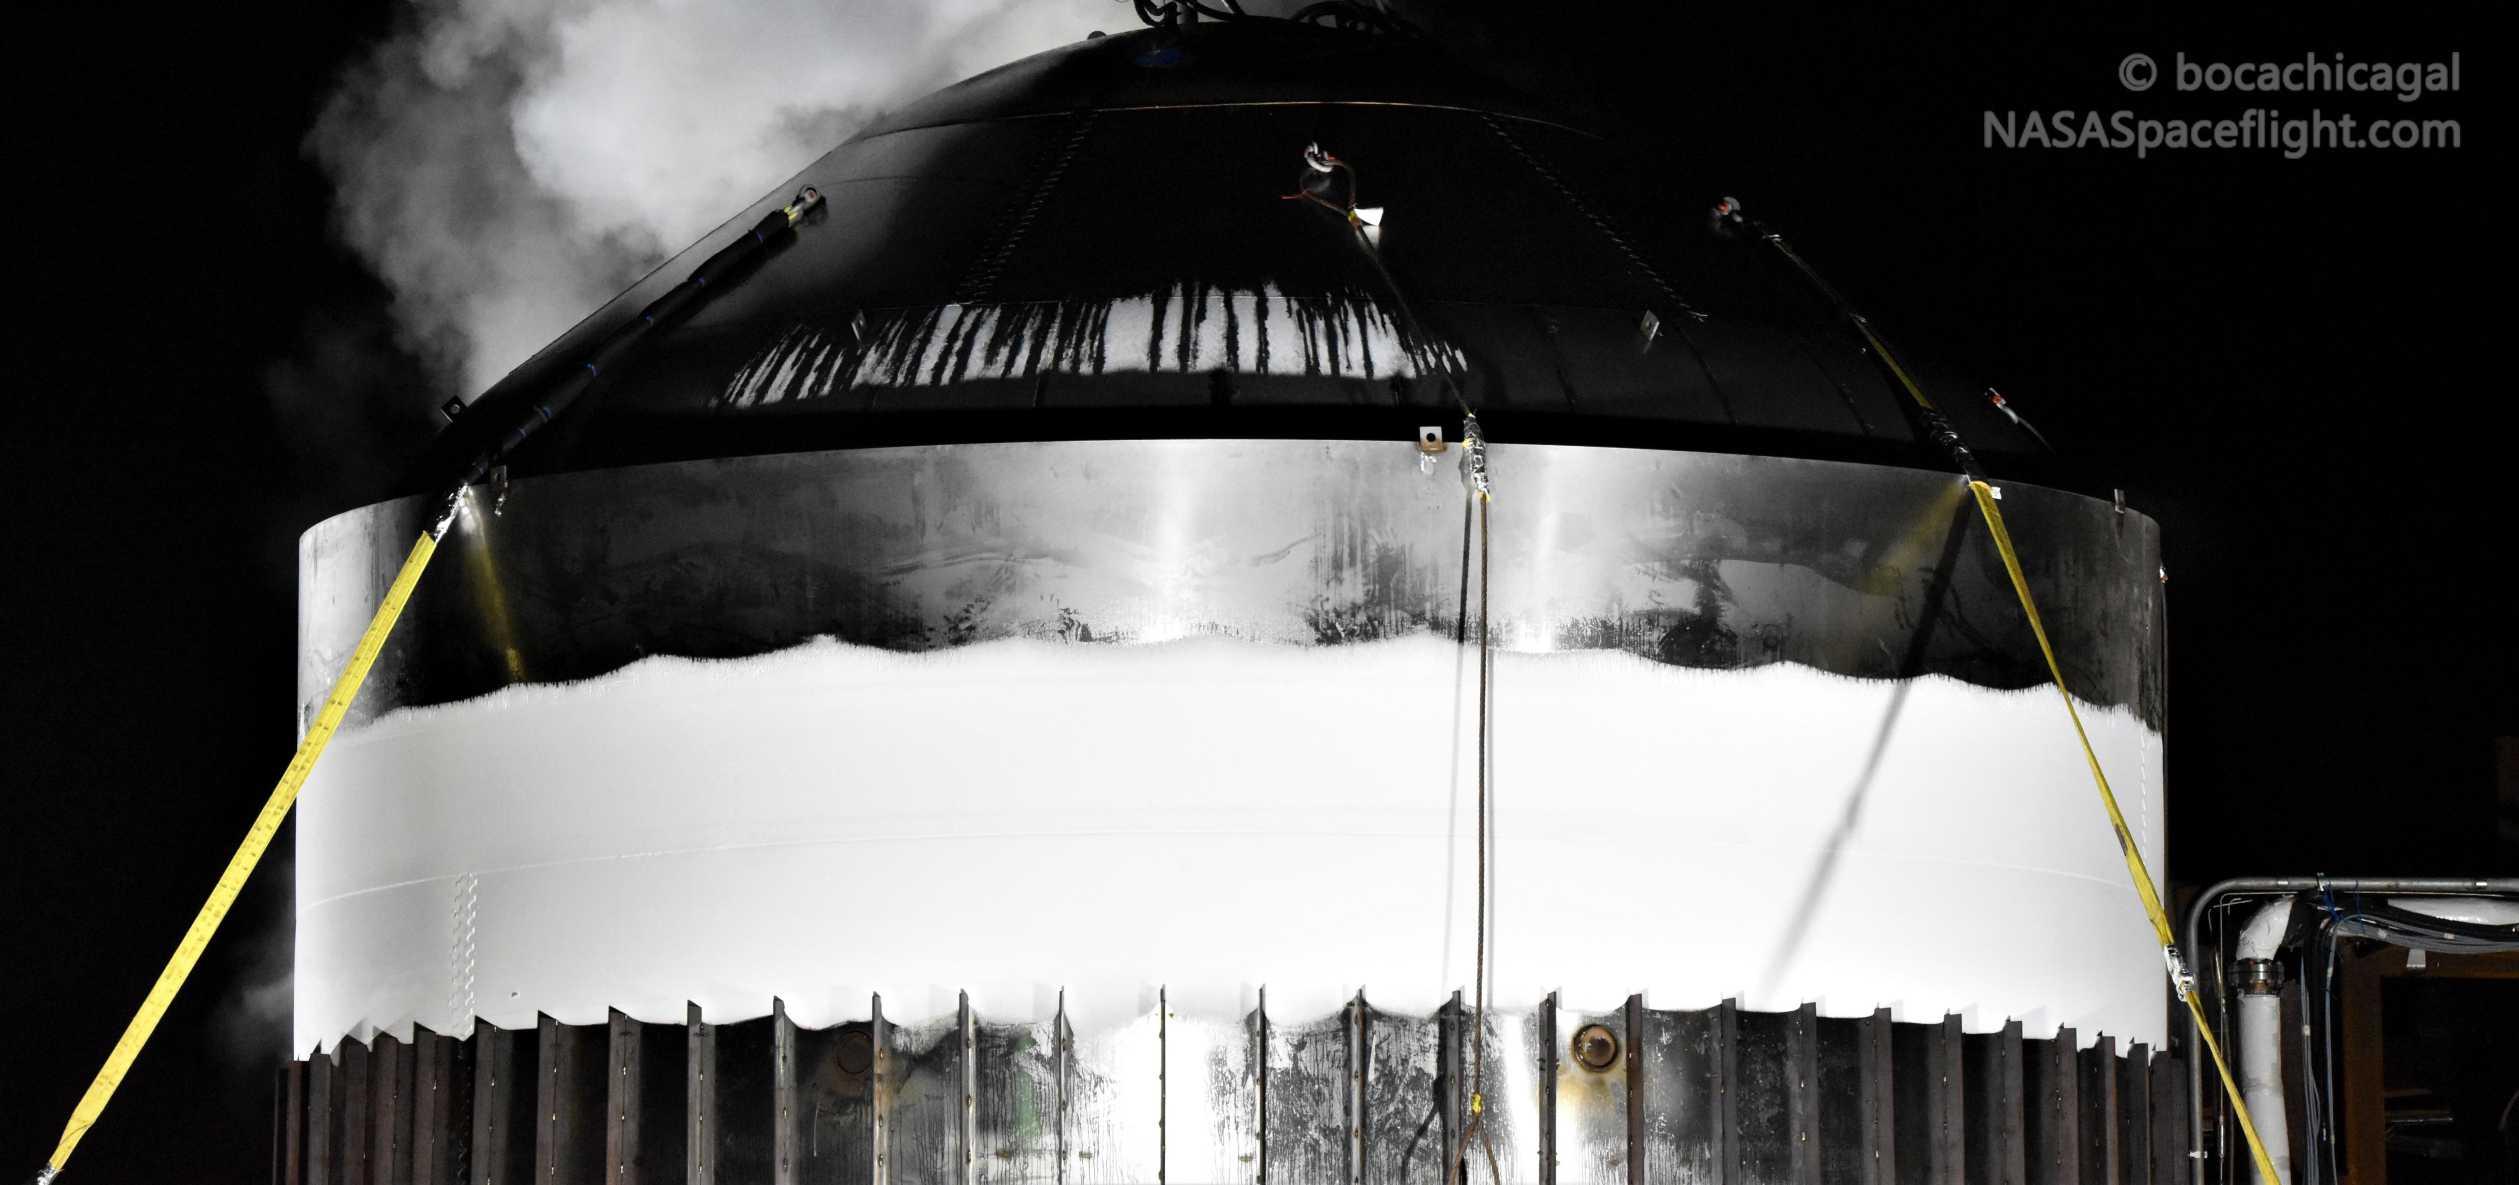 Starship Boca Chica 012820 (NASASpaceflight – bocachicagal) frosty test tank #2 4 crop (c)